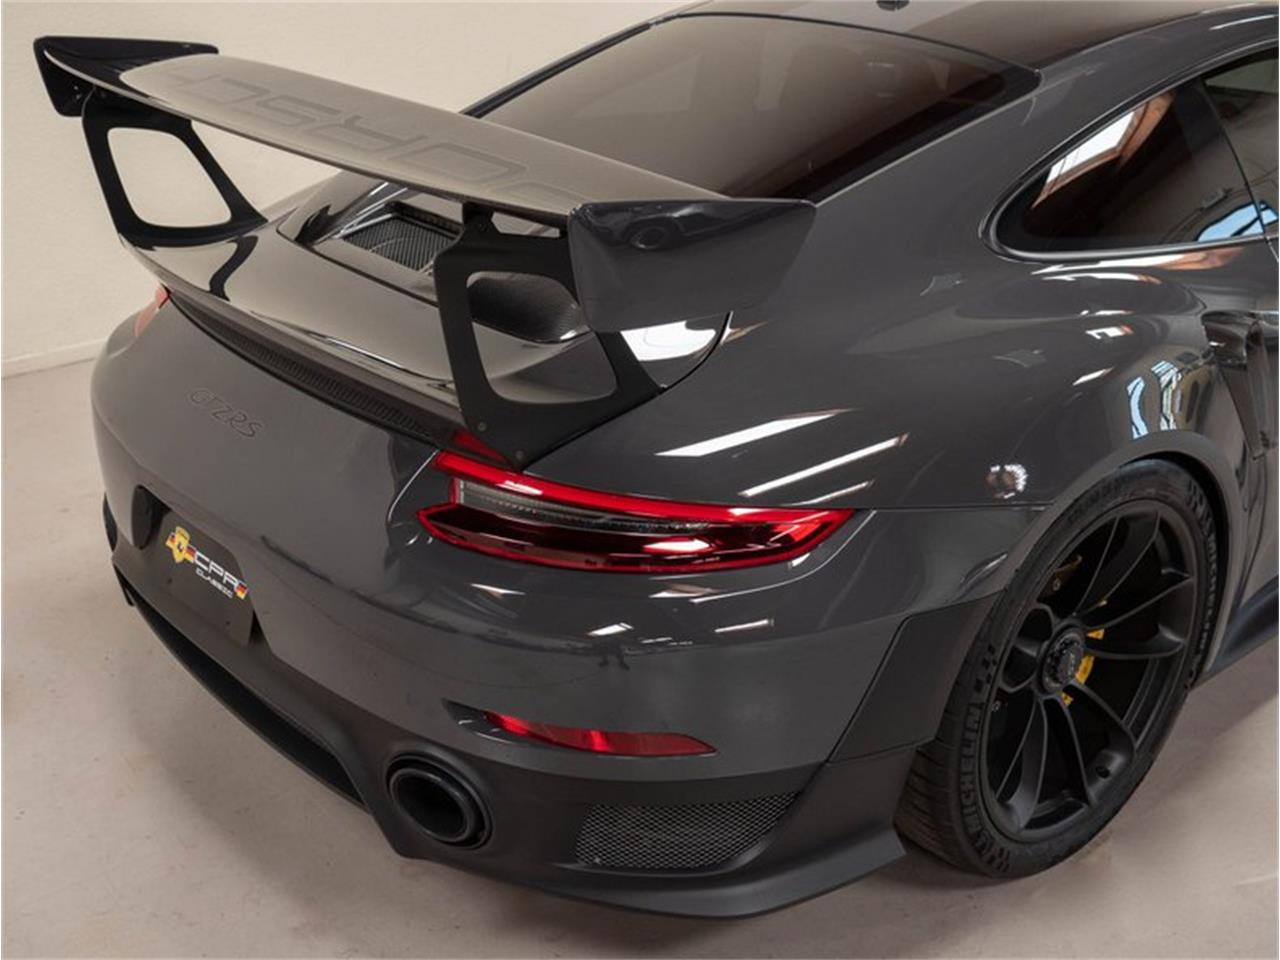 2019 Porsche 911 (CC-1358330) for sale in Fallbrook, California